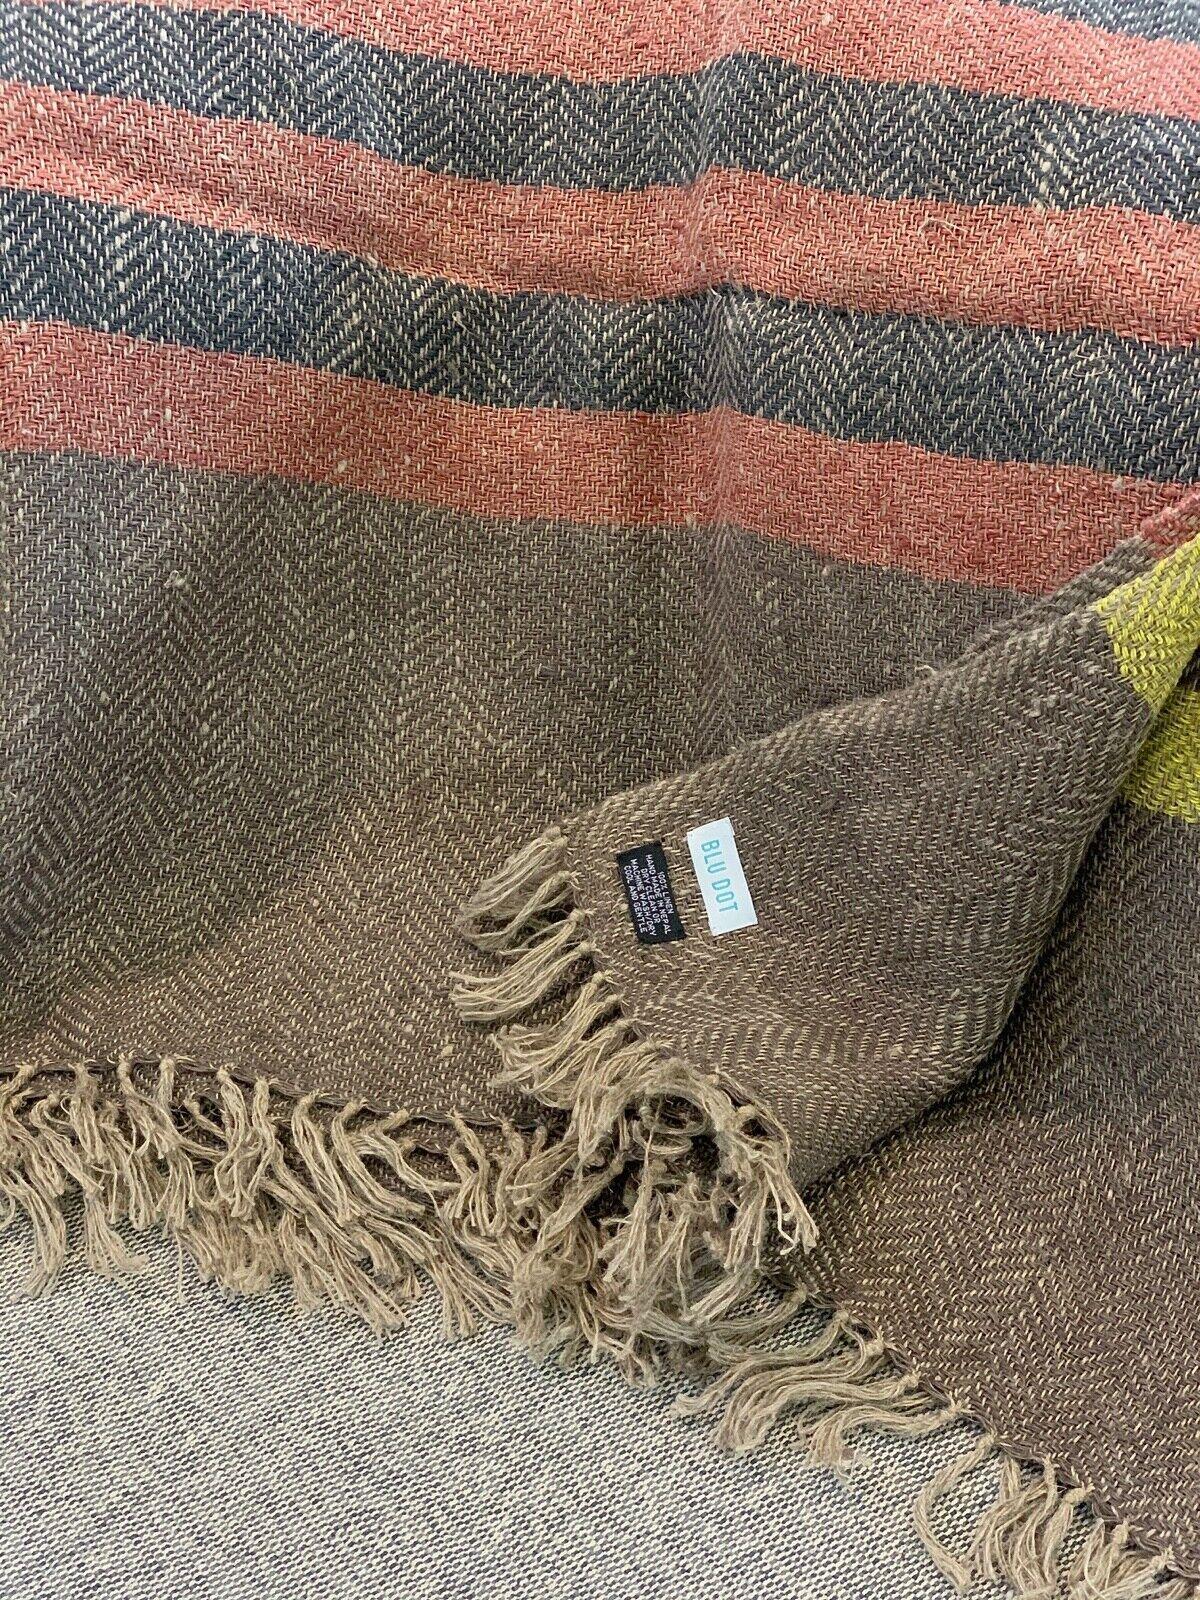 Blu Dot Linen Throw Blanket - Color Mix 2